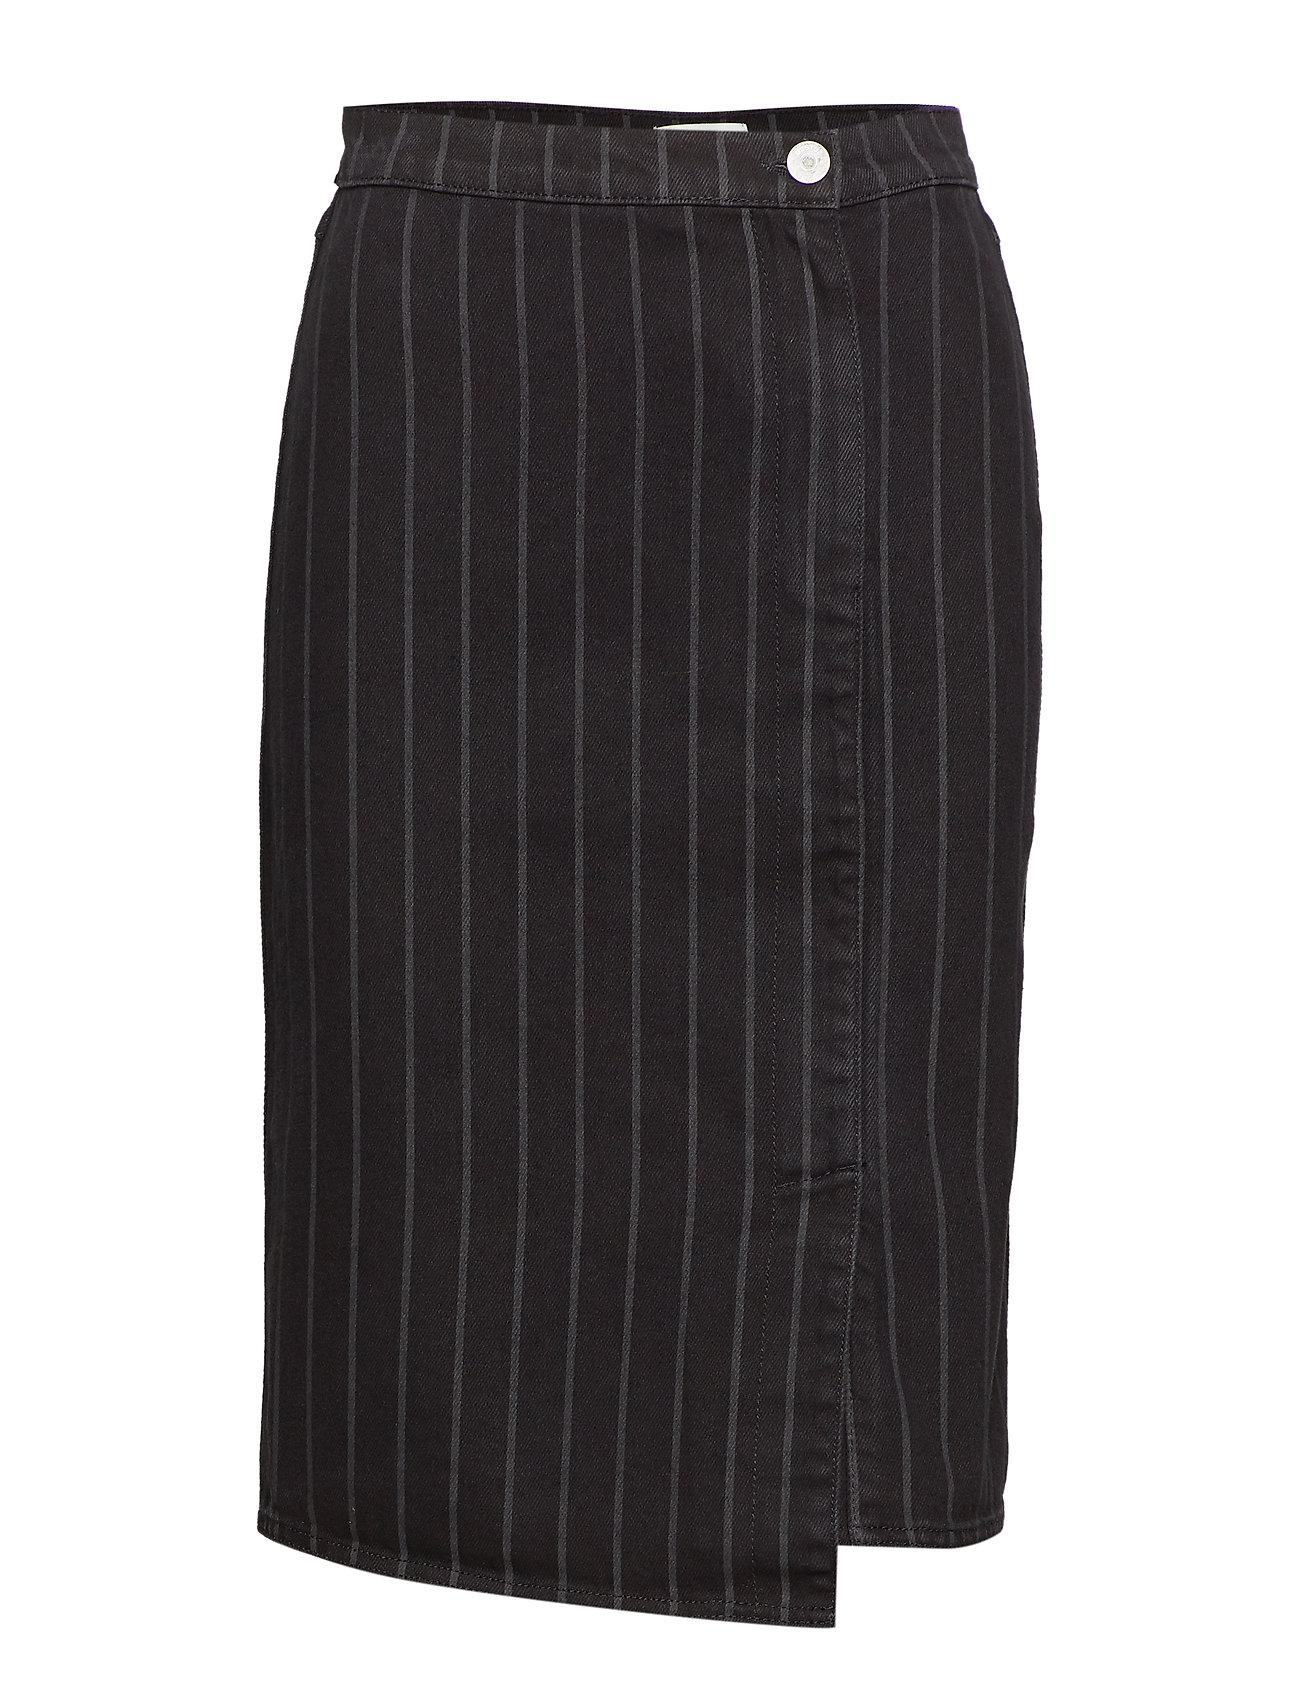 Gestuz Emma HW skirt SO19 - BLACK PINSTRIPE